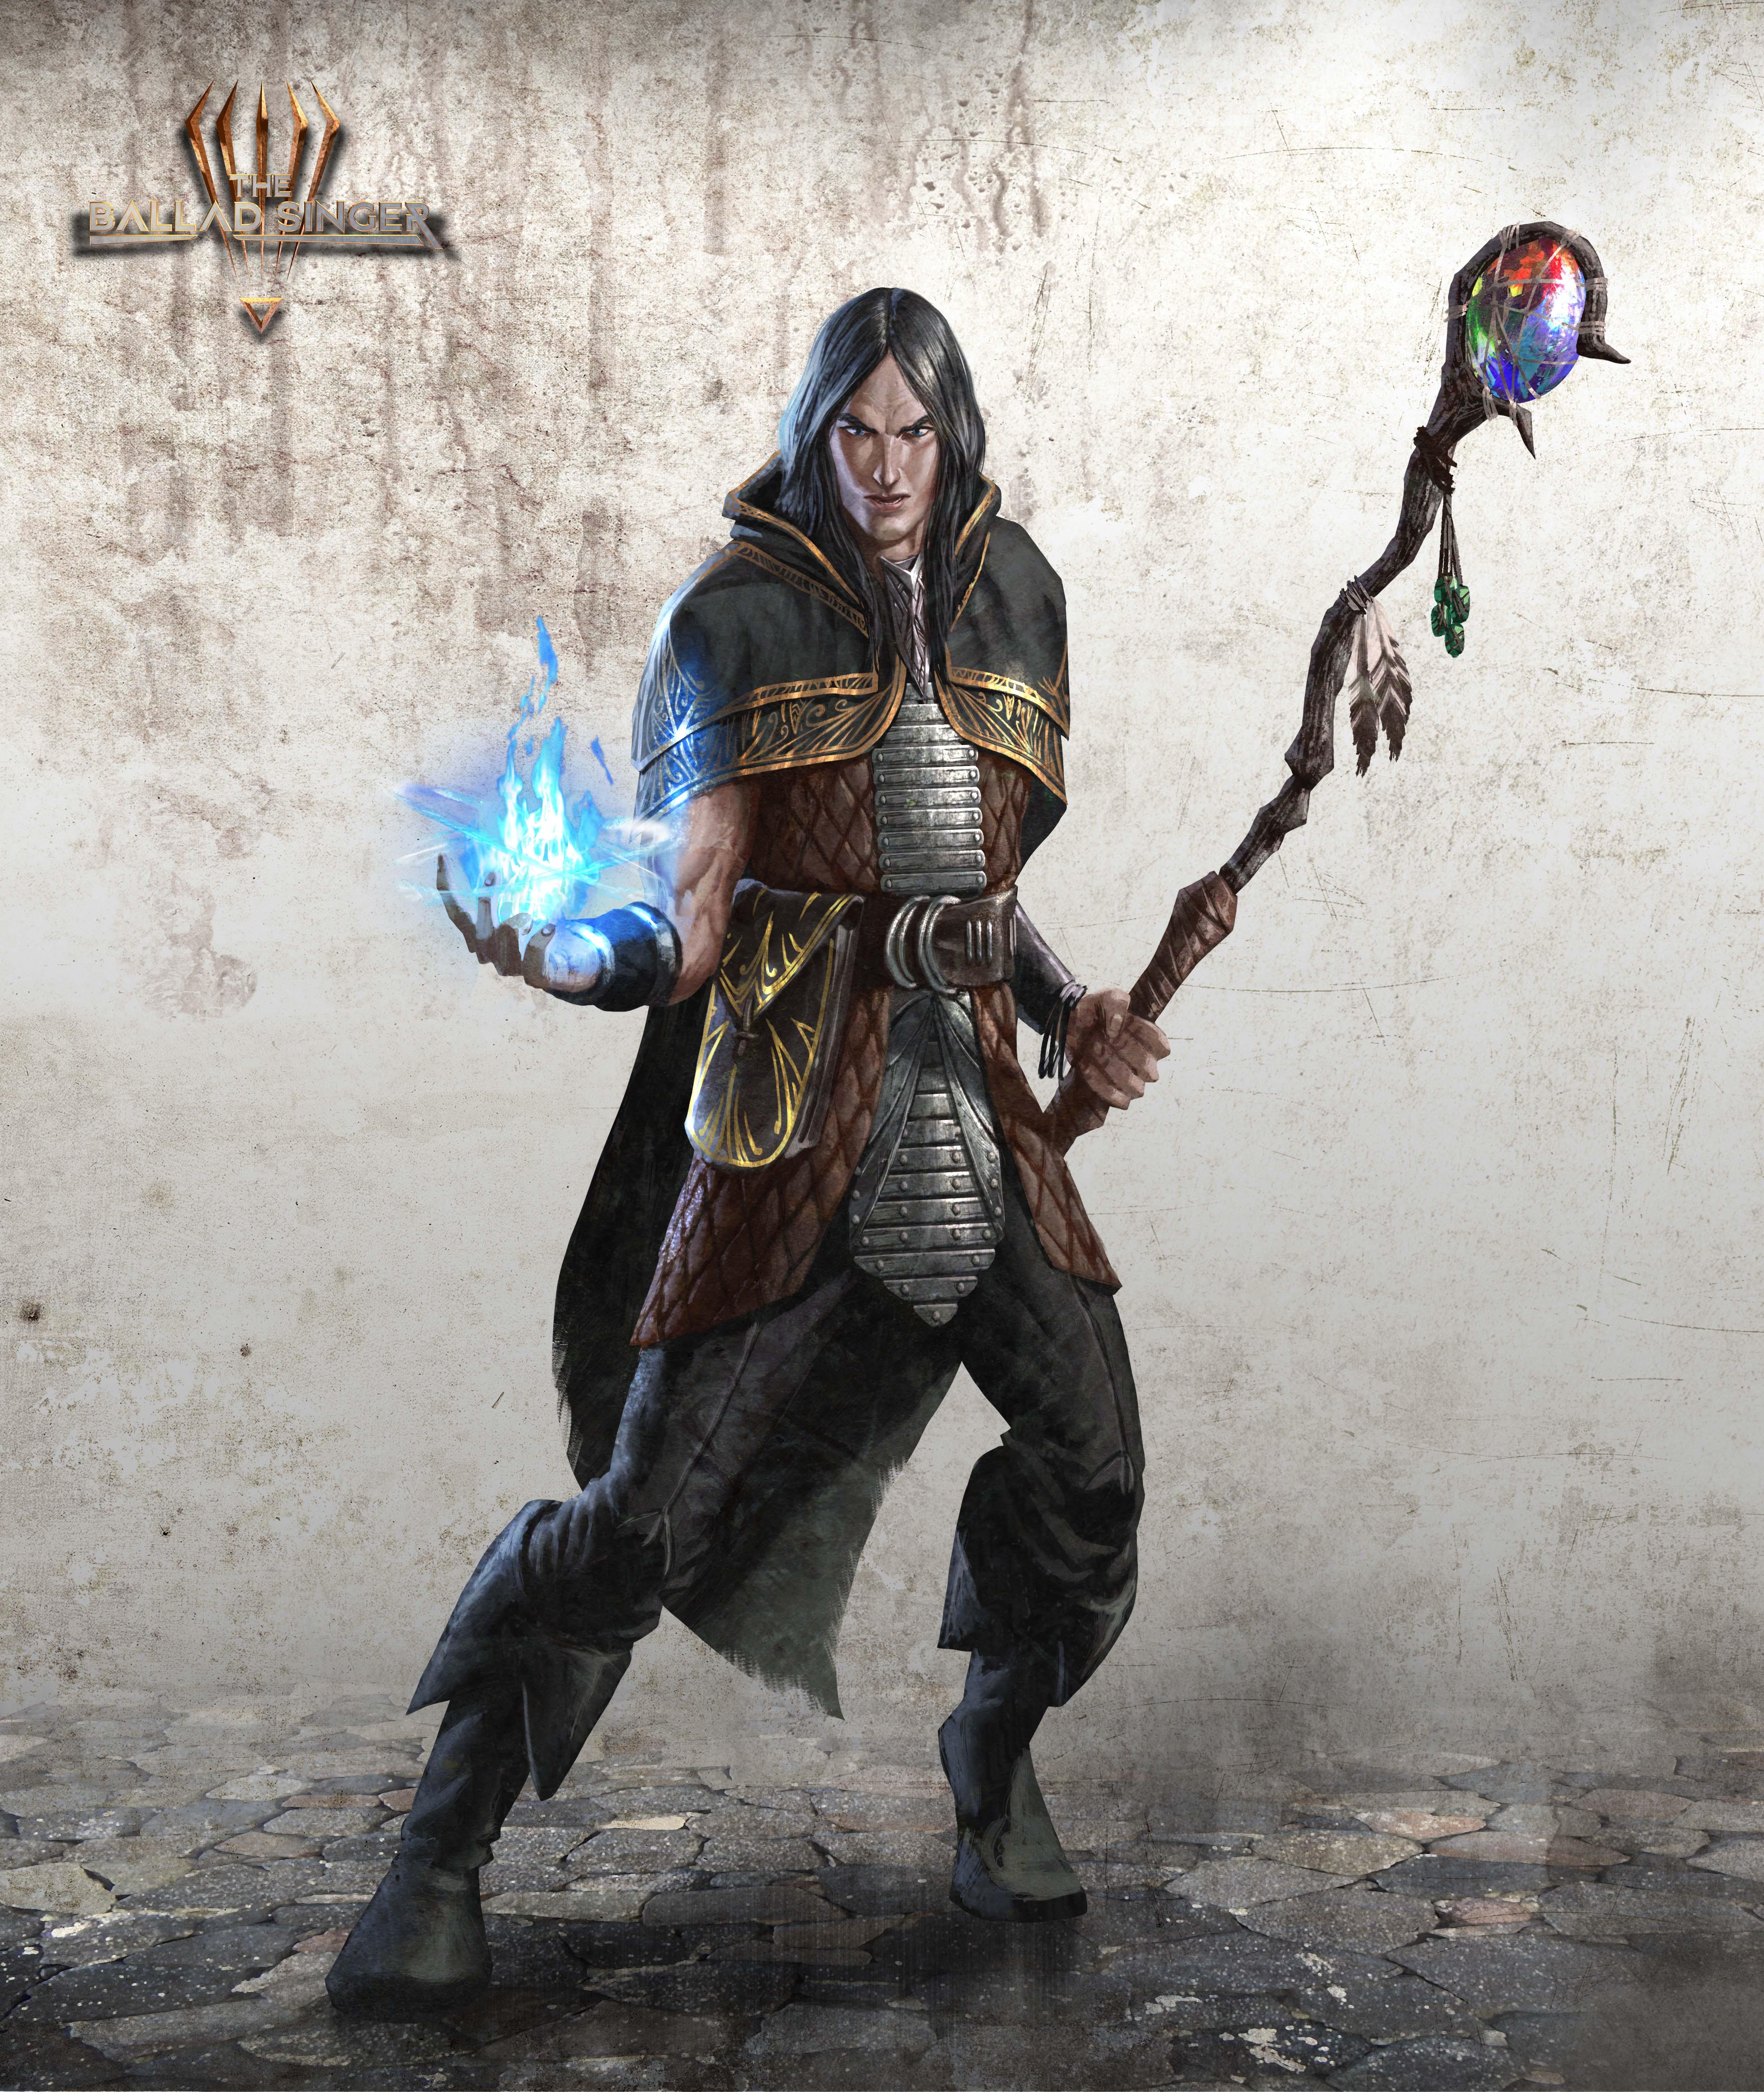 Leon - Playable character